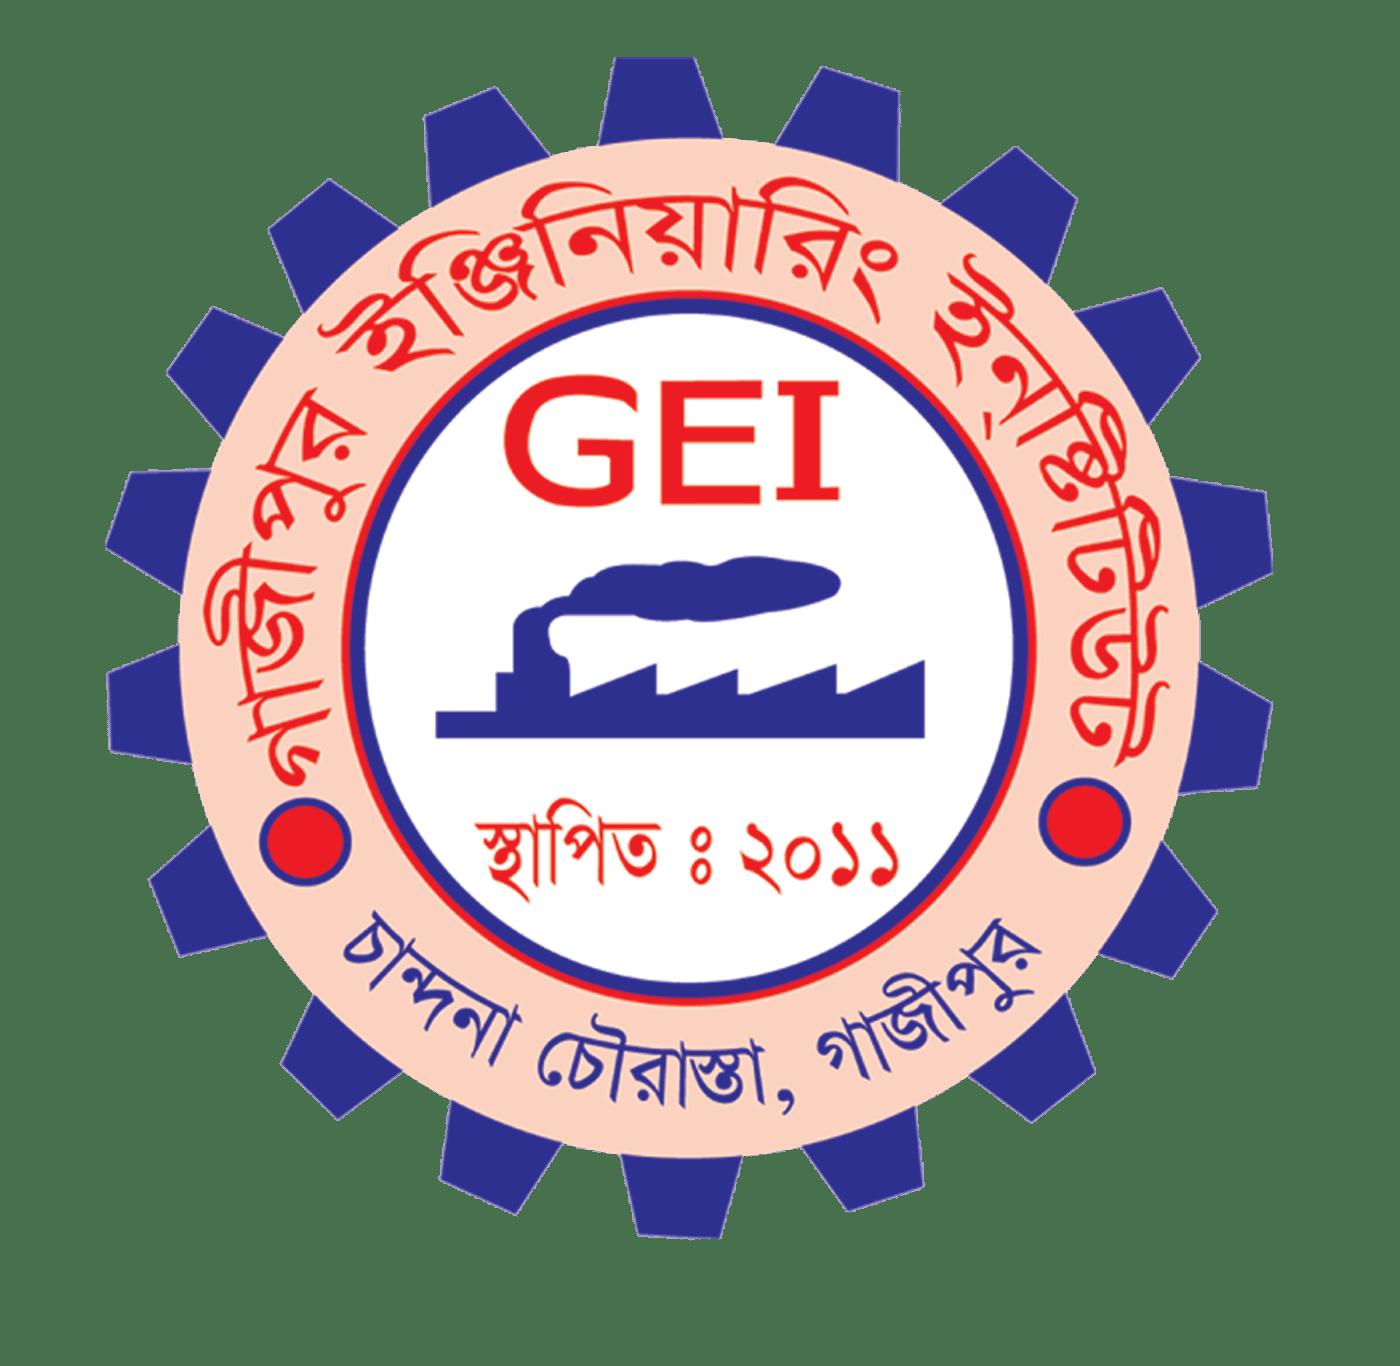 Gazipur Engineering College